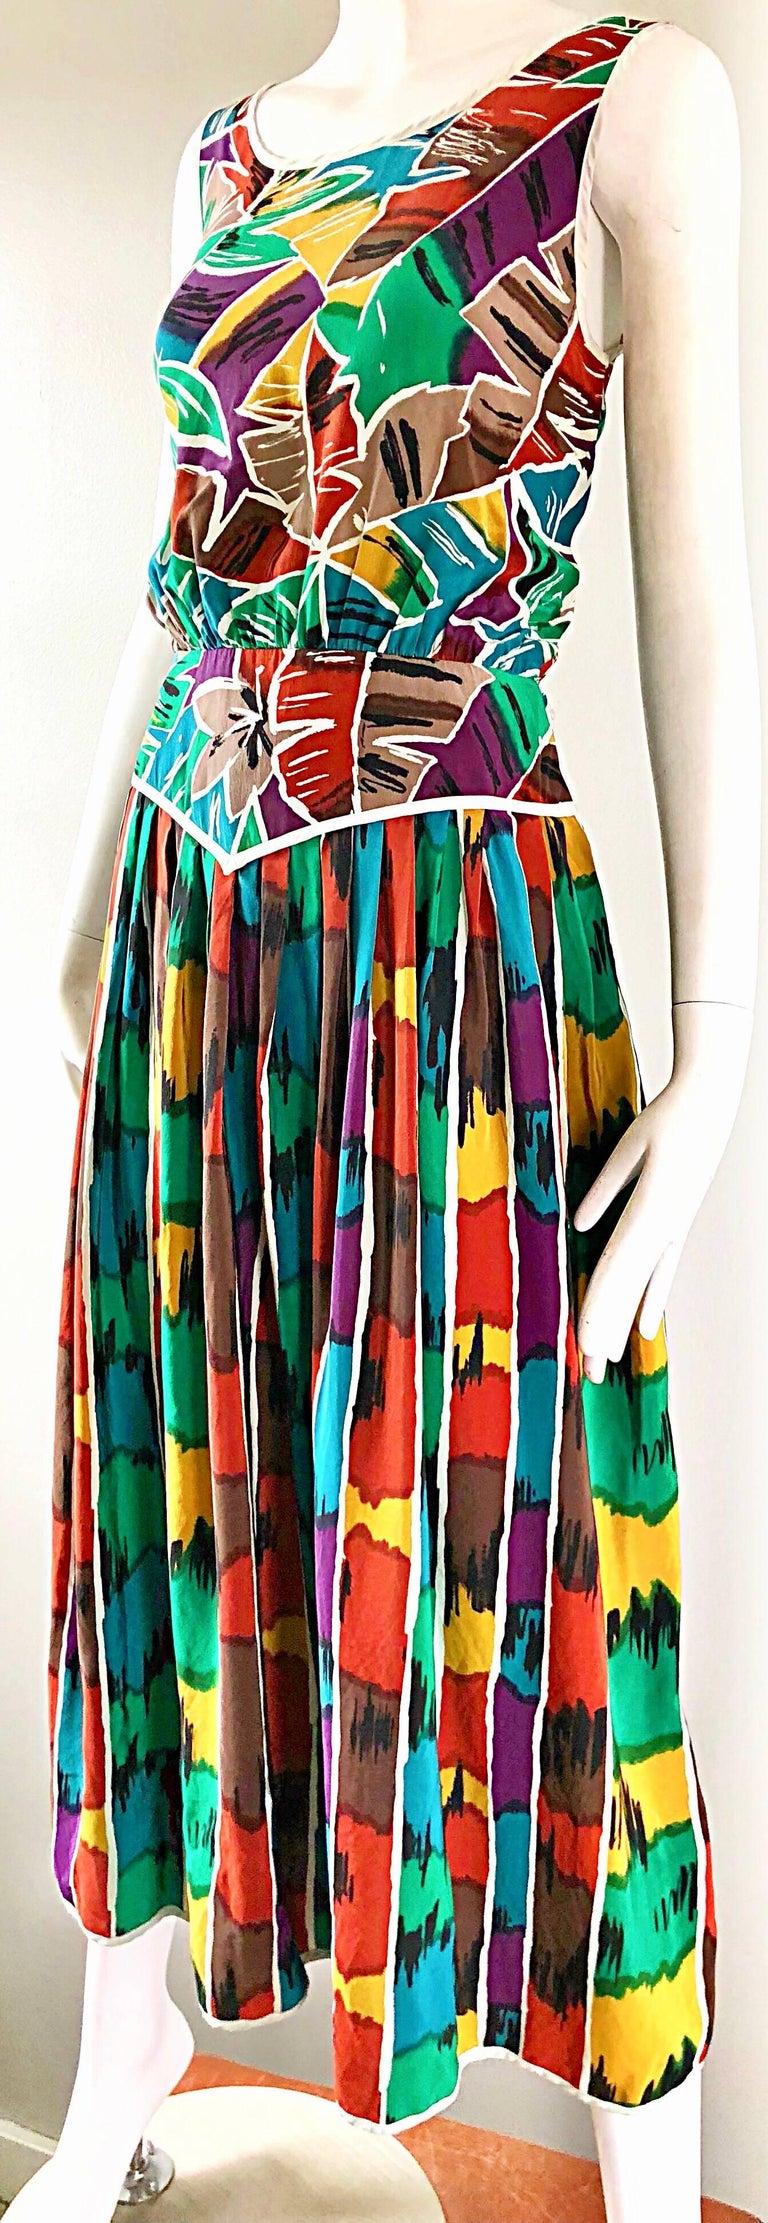 Vintage Oscar de la Renta Size 8 / 10 Kaleidoscope Print Silk Sleeveless Dress For Sale 1